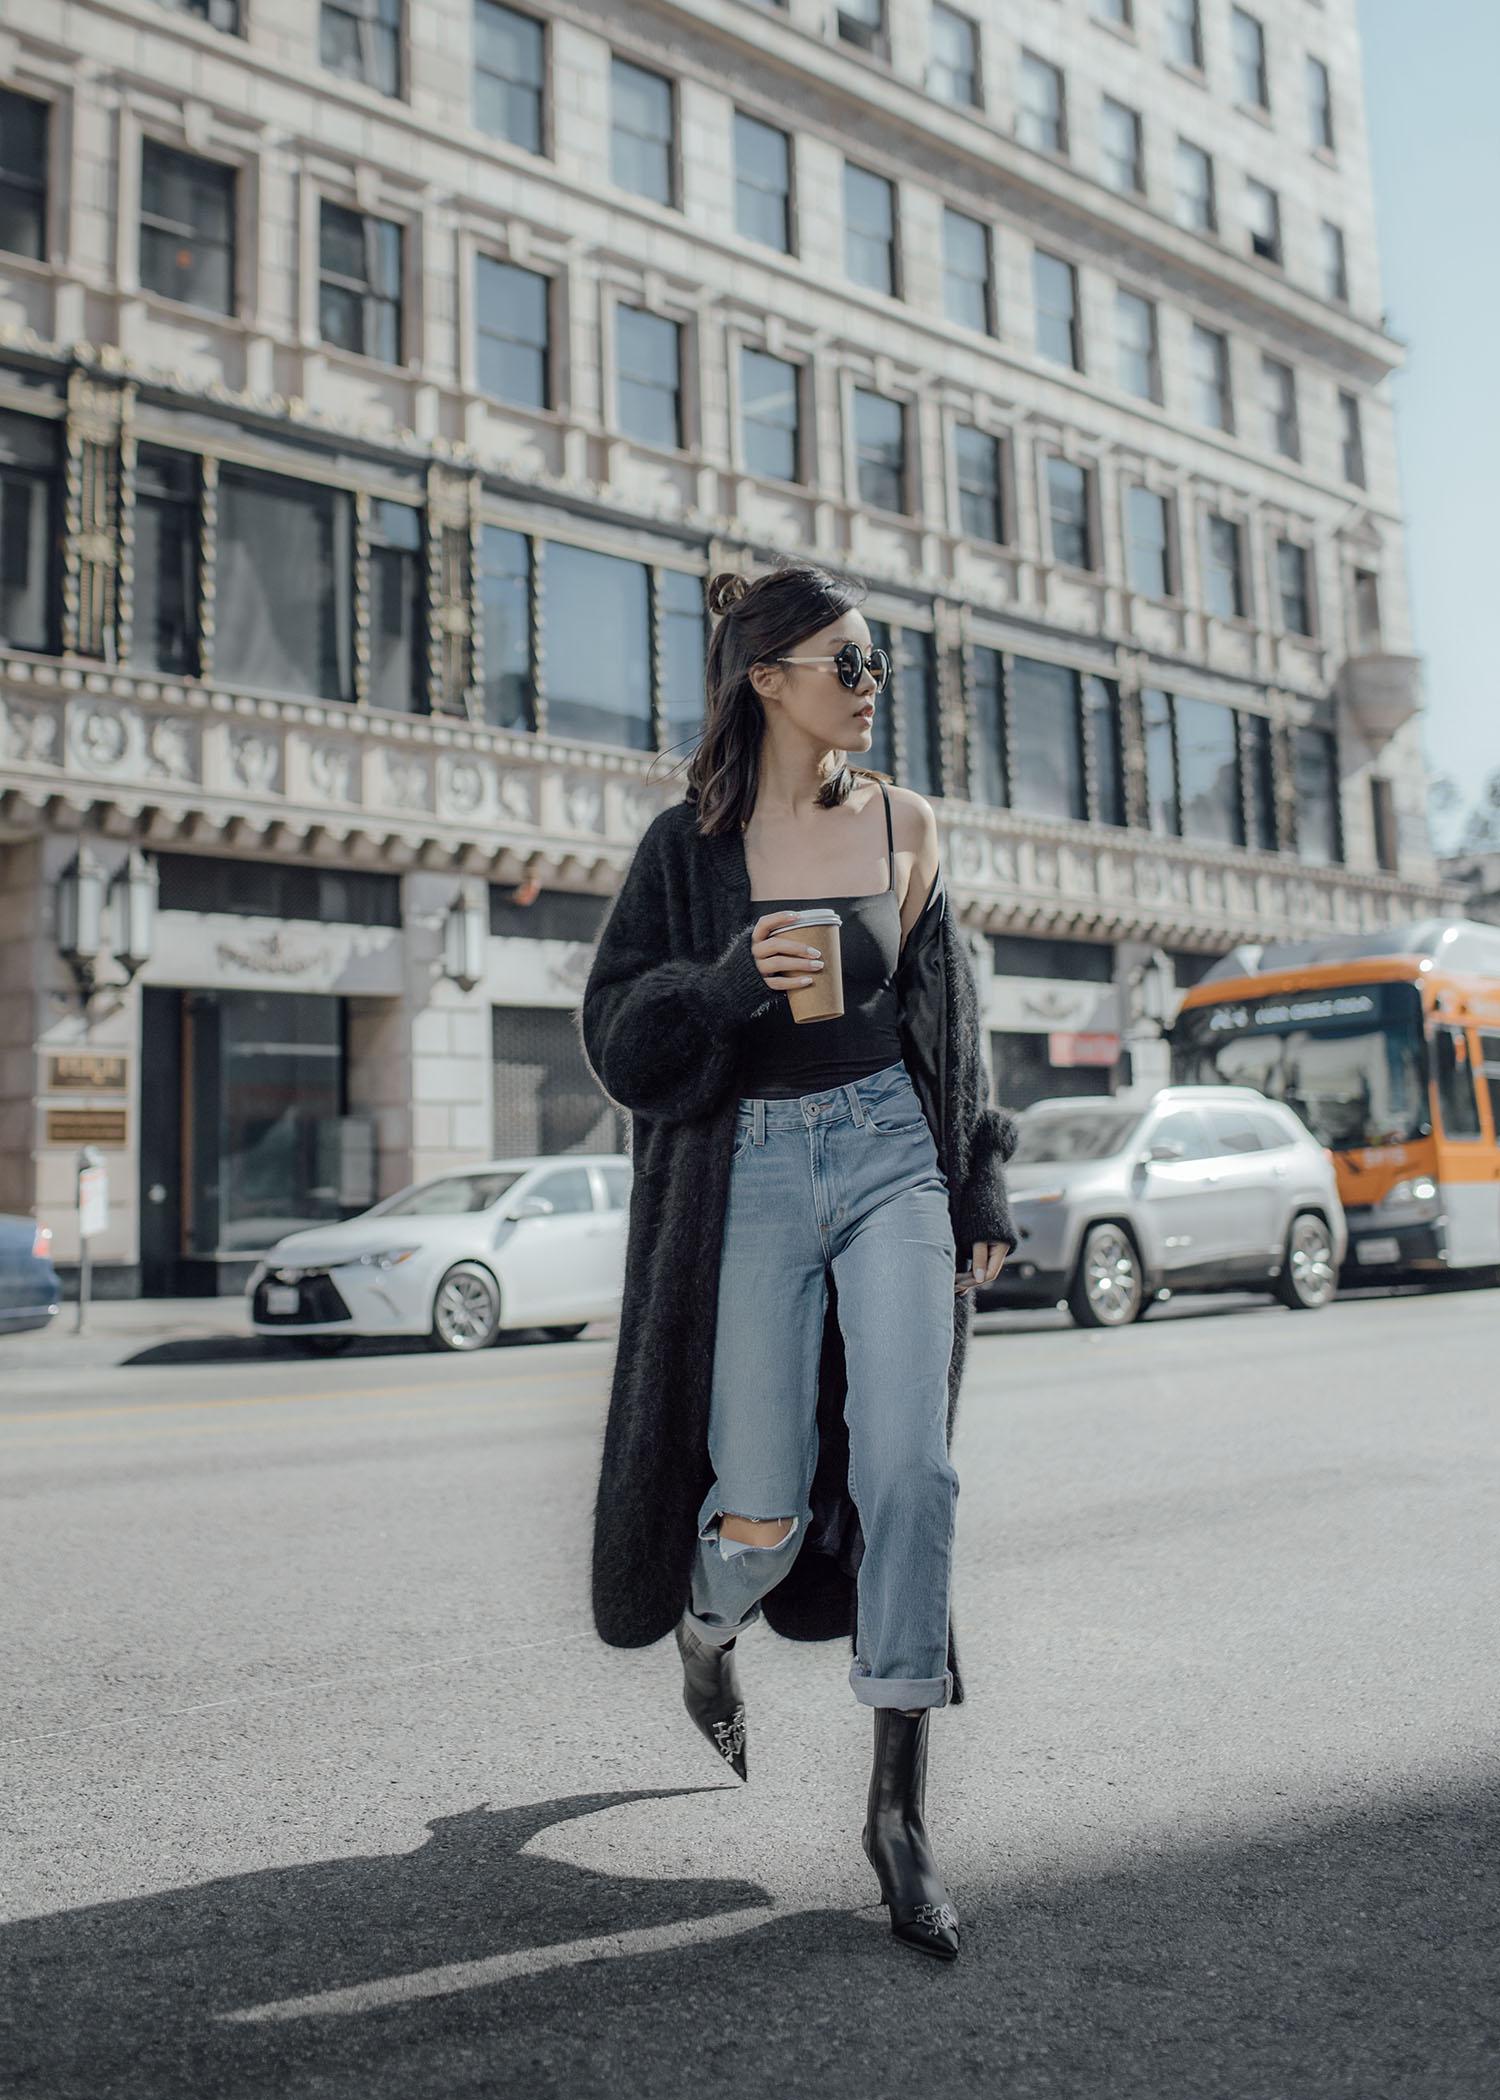 bytsang fuzzy cardigan coat Jenny Tsang of Tsangtastic styling different ways to wear long coats